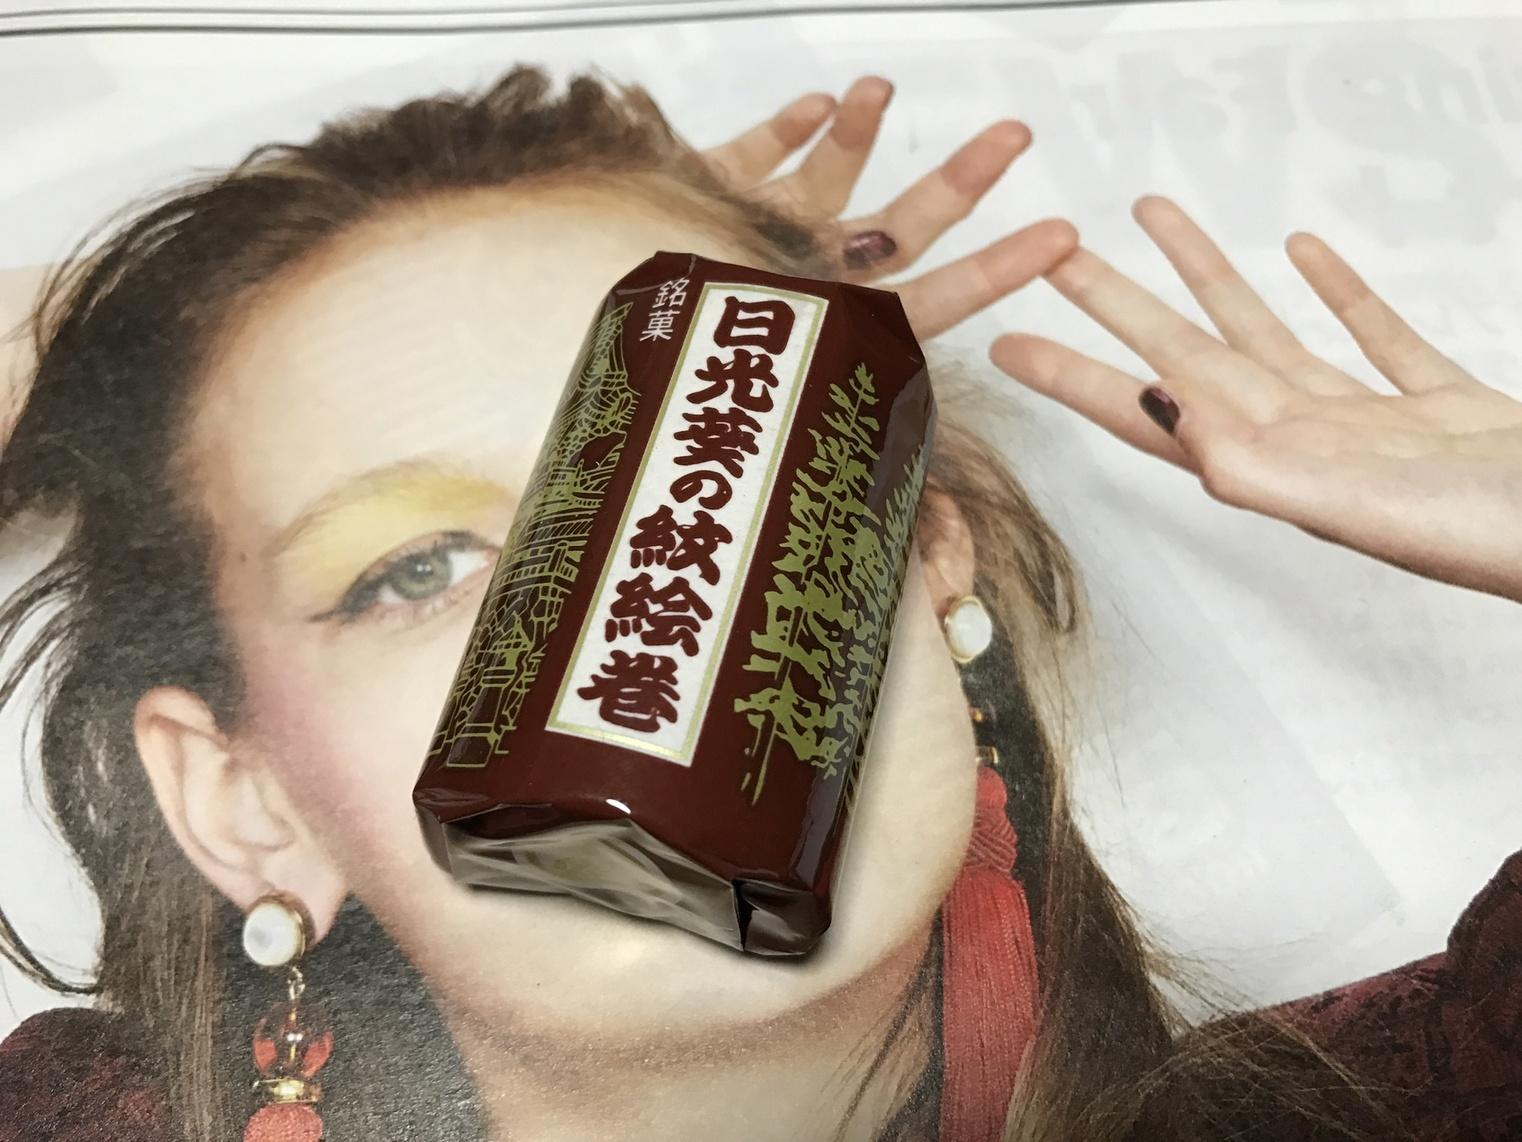 鬼怒川観光ホテル name=